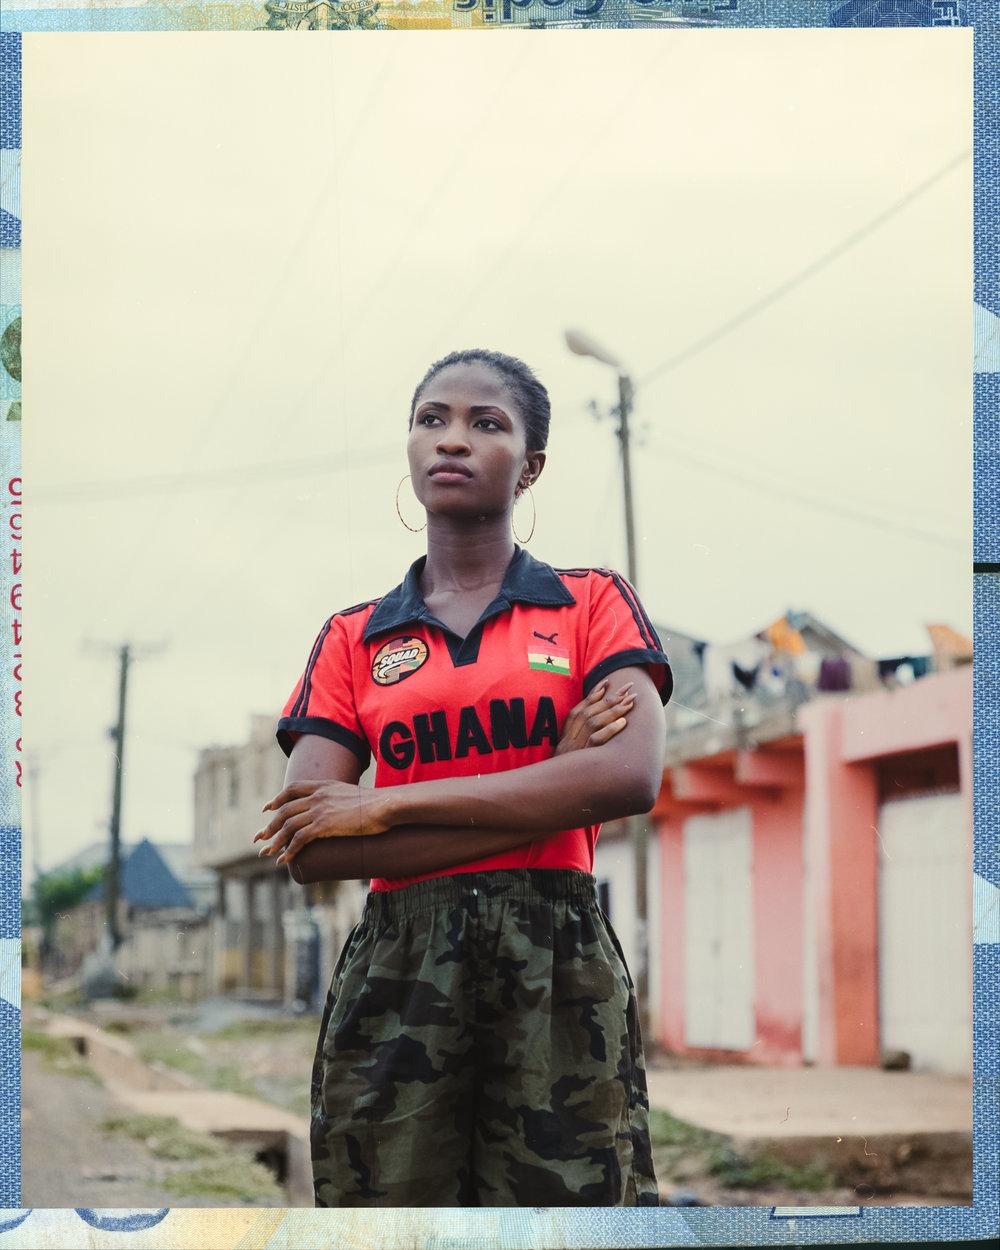 Ghana_Lookbook (1).jpg